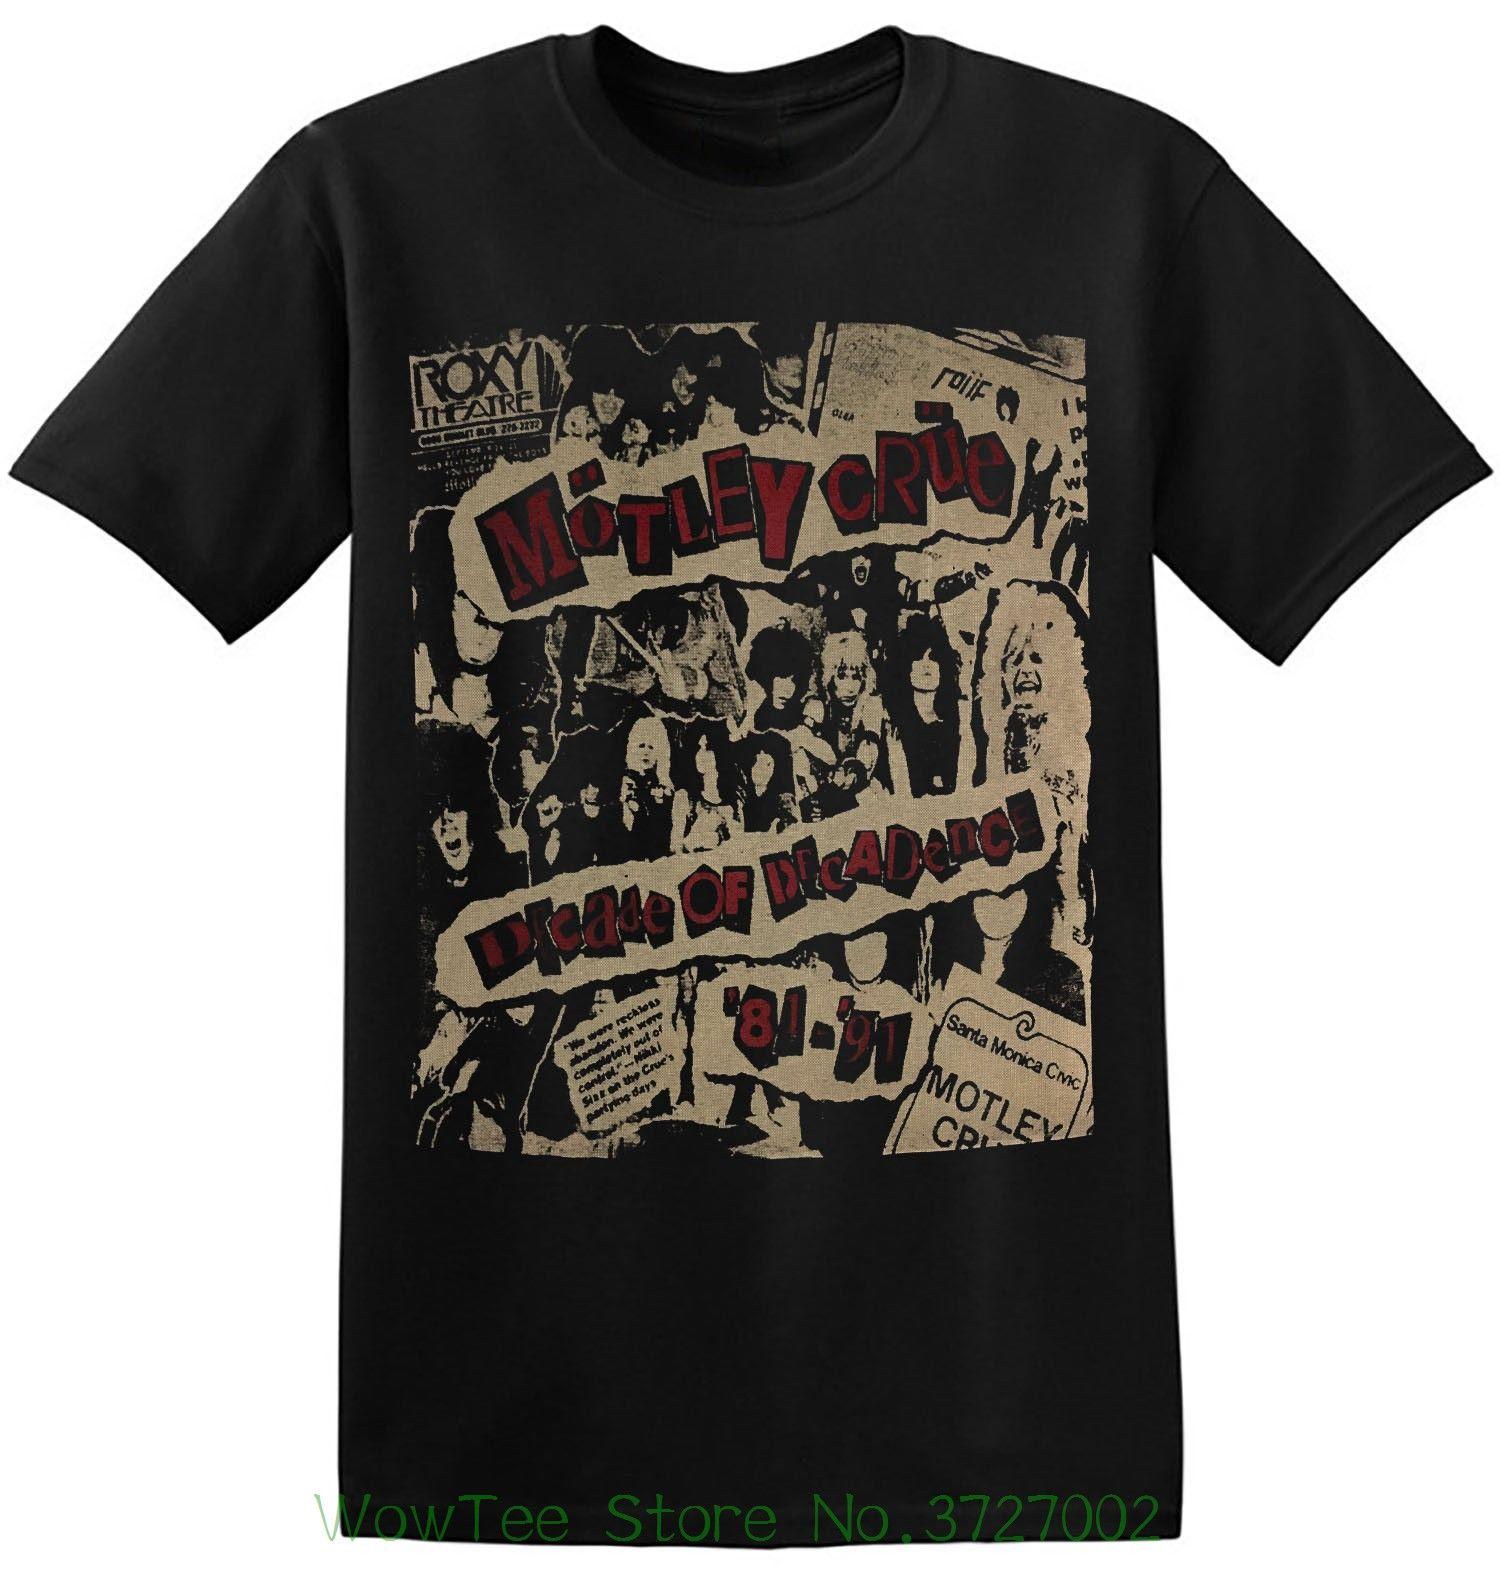 Grosshandel Motley Crue T Shirt Old Band Shirts Schwarz Vintage